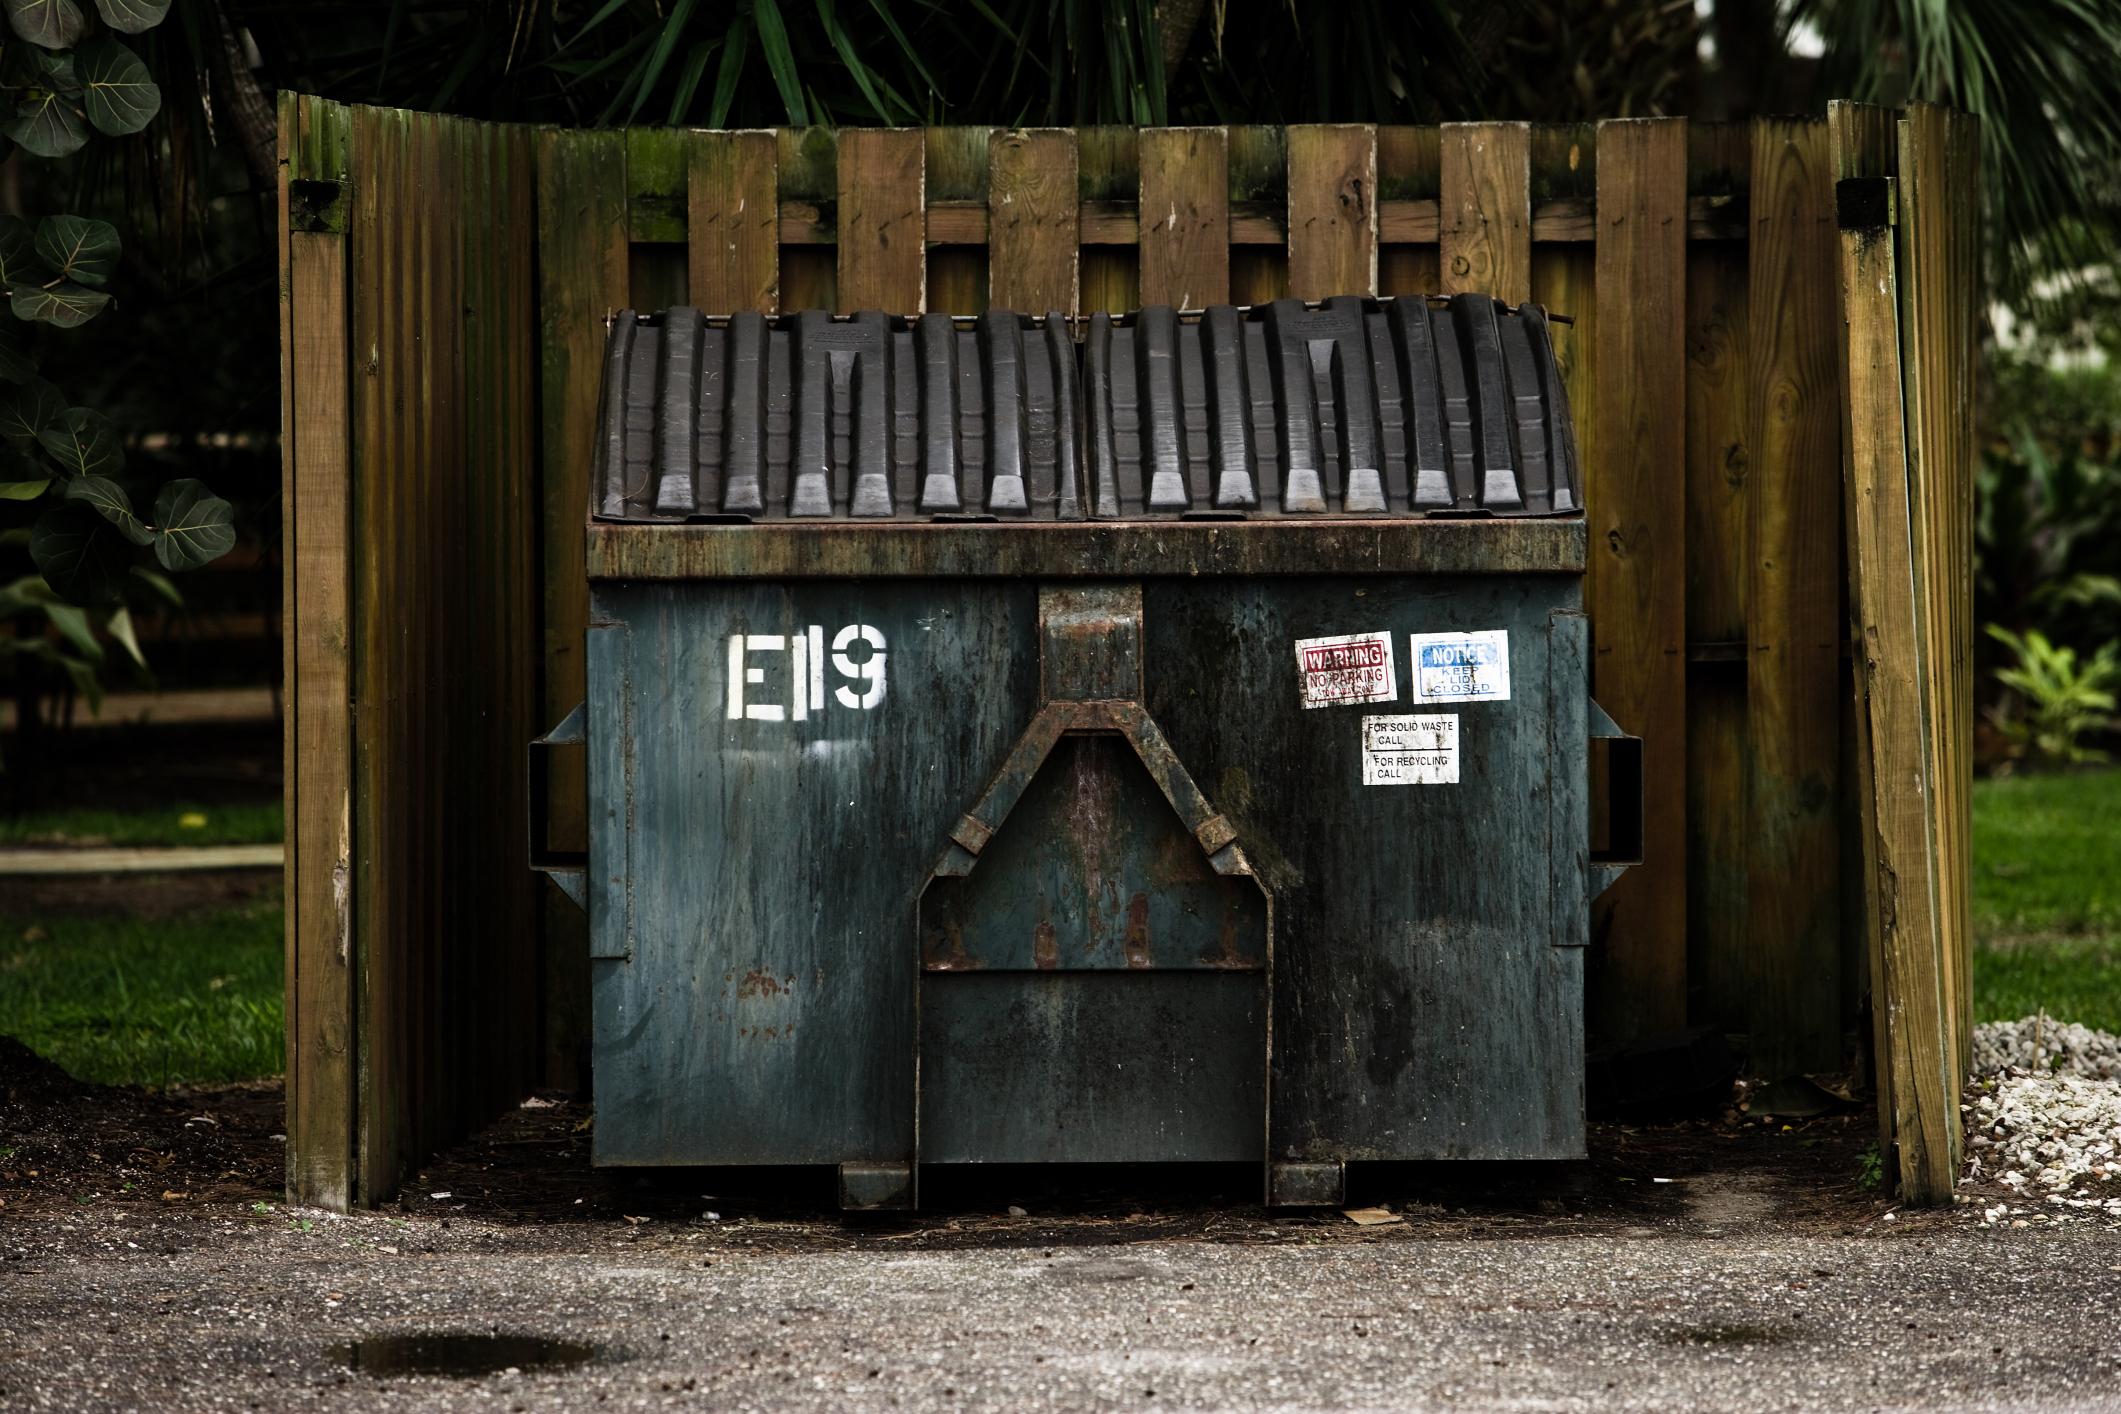 How to Empty Waste Toner   Bizfluent